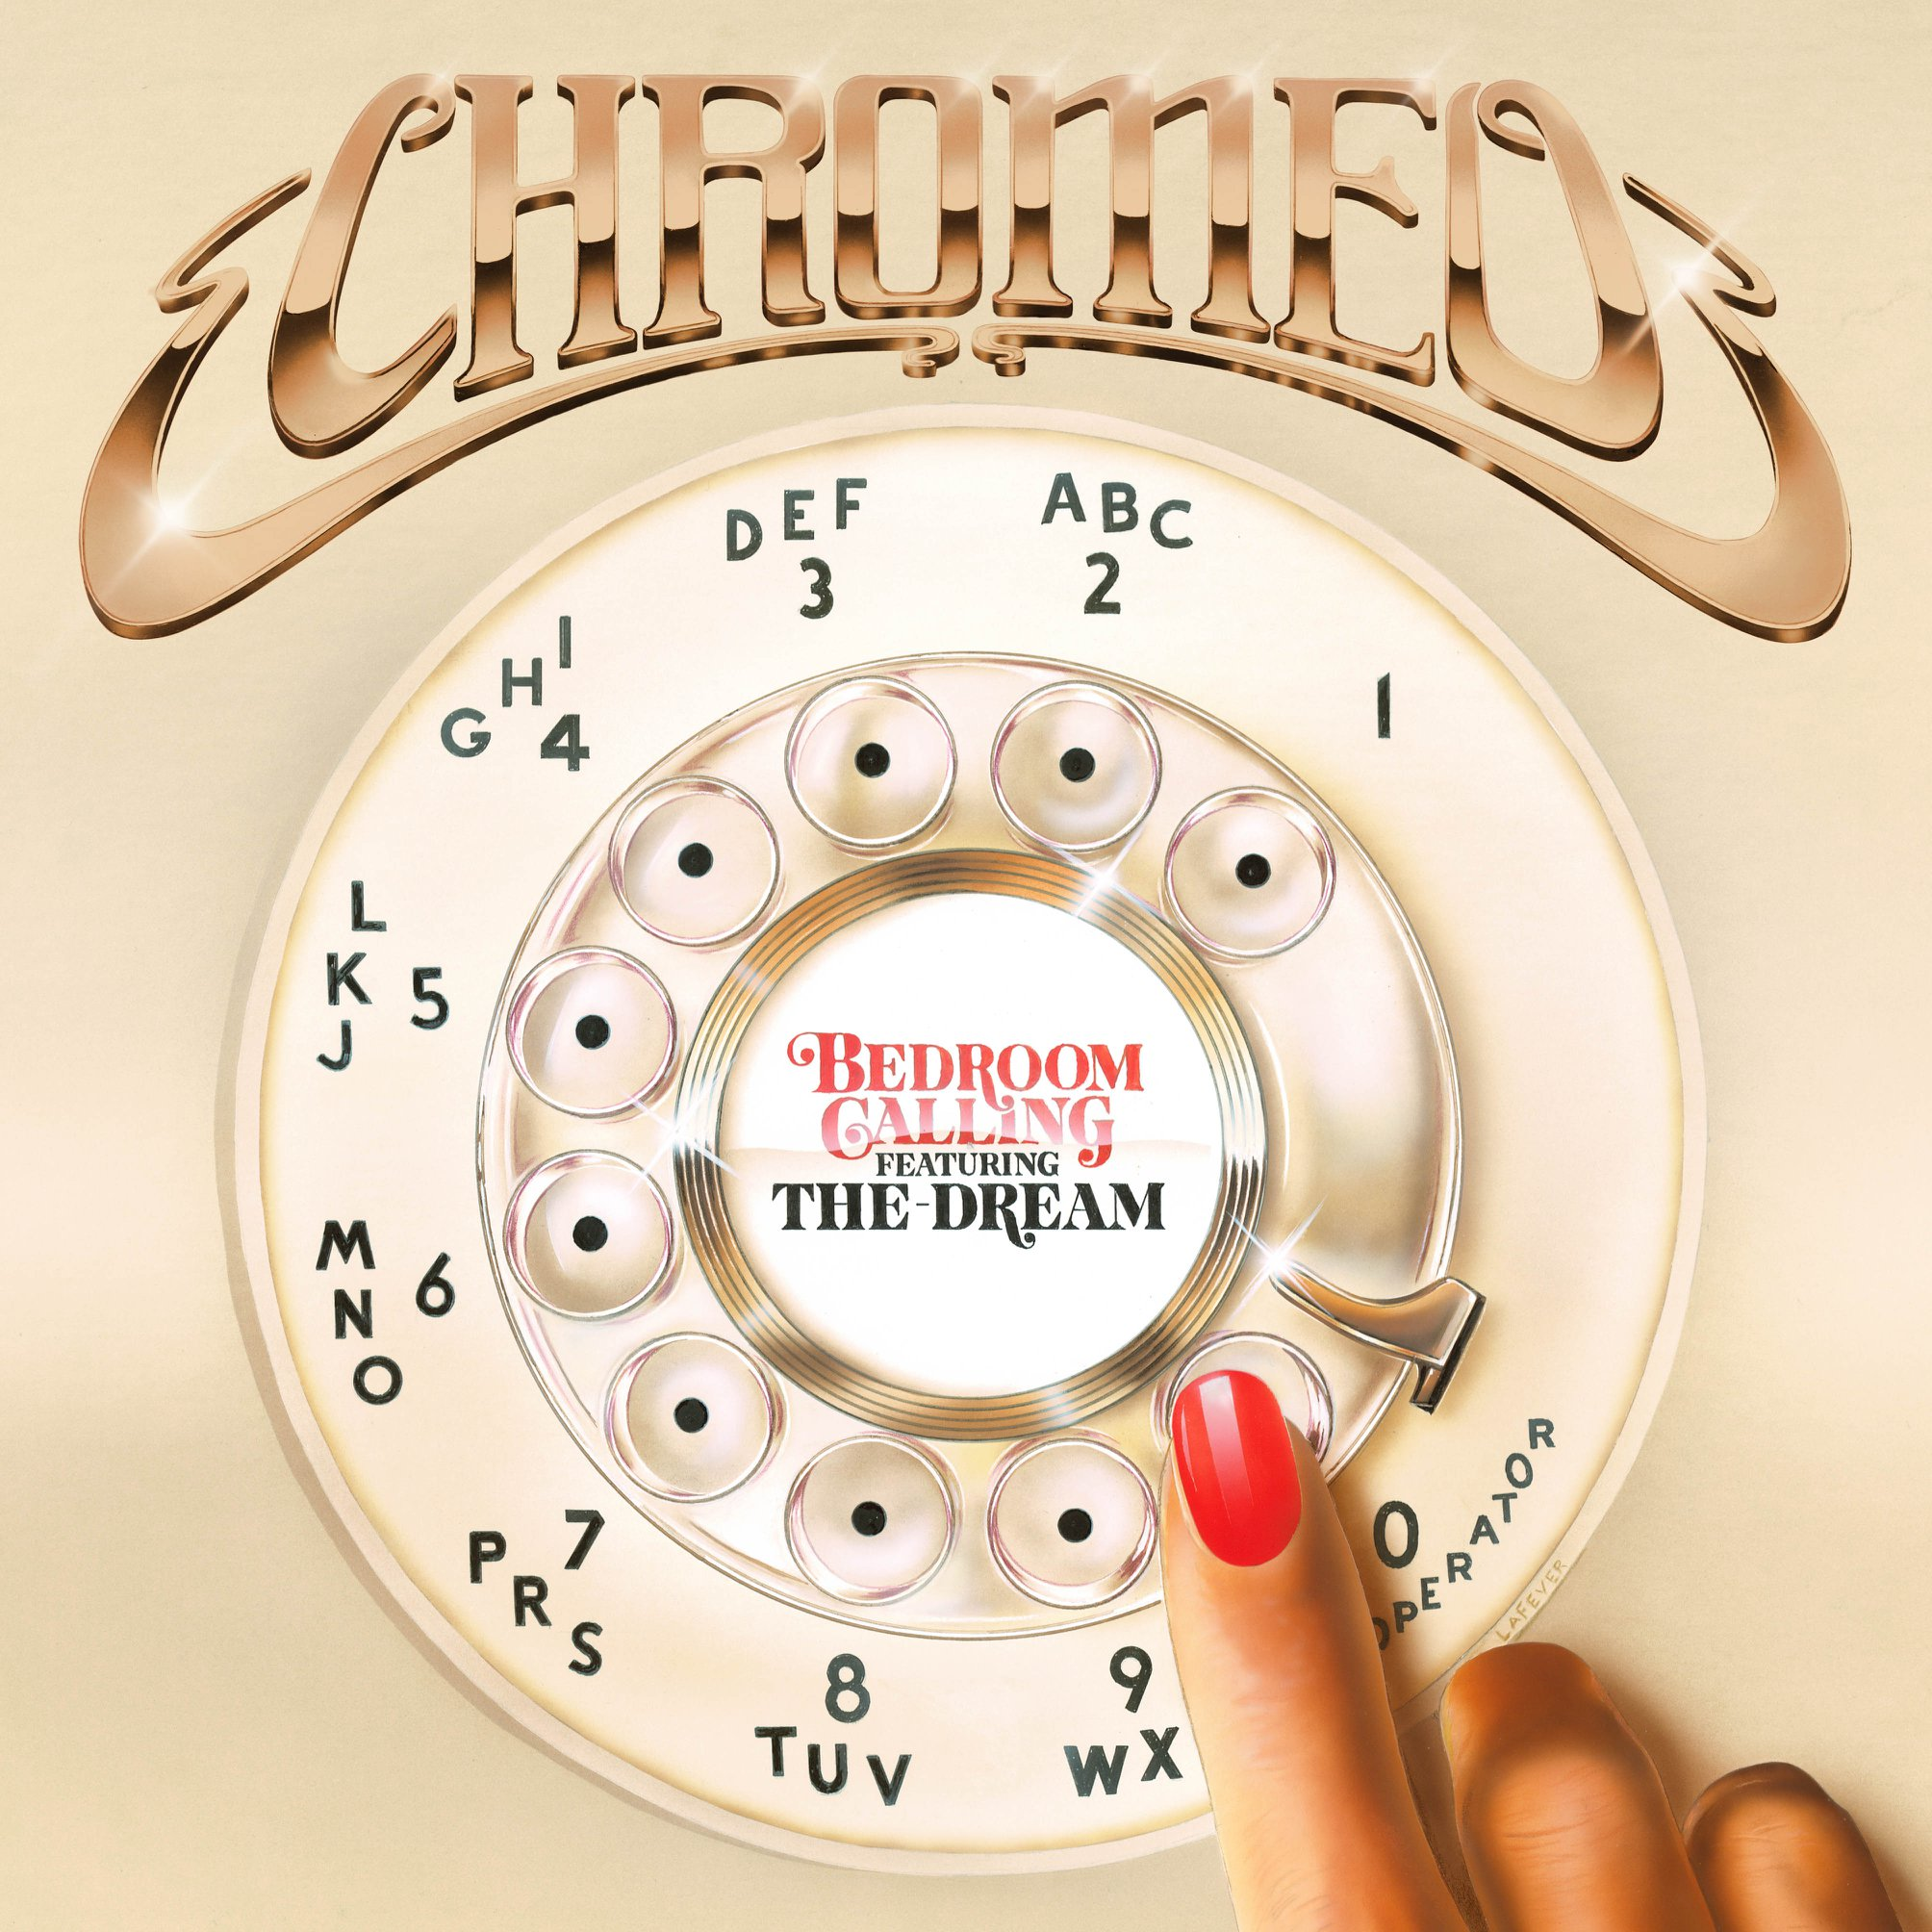 chromeo bedroom calling the dream Chromeo enlist The Dream for sexy new song Bedroom Calling: Stream